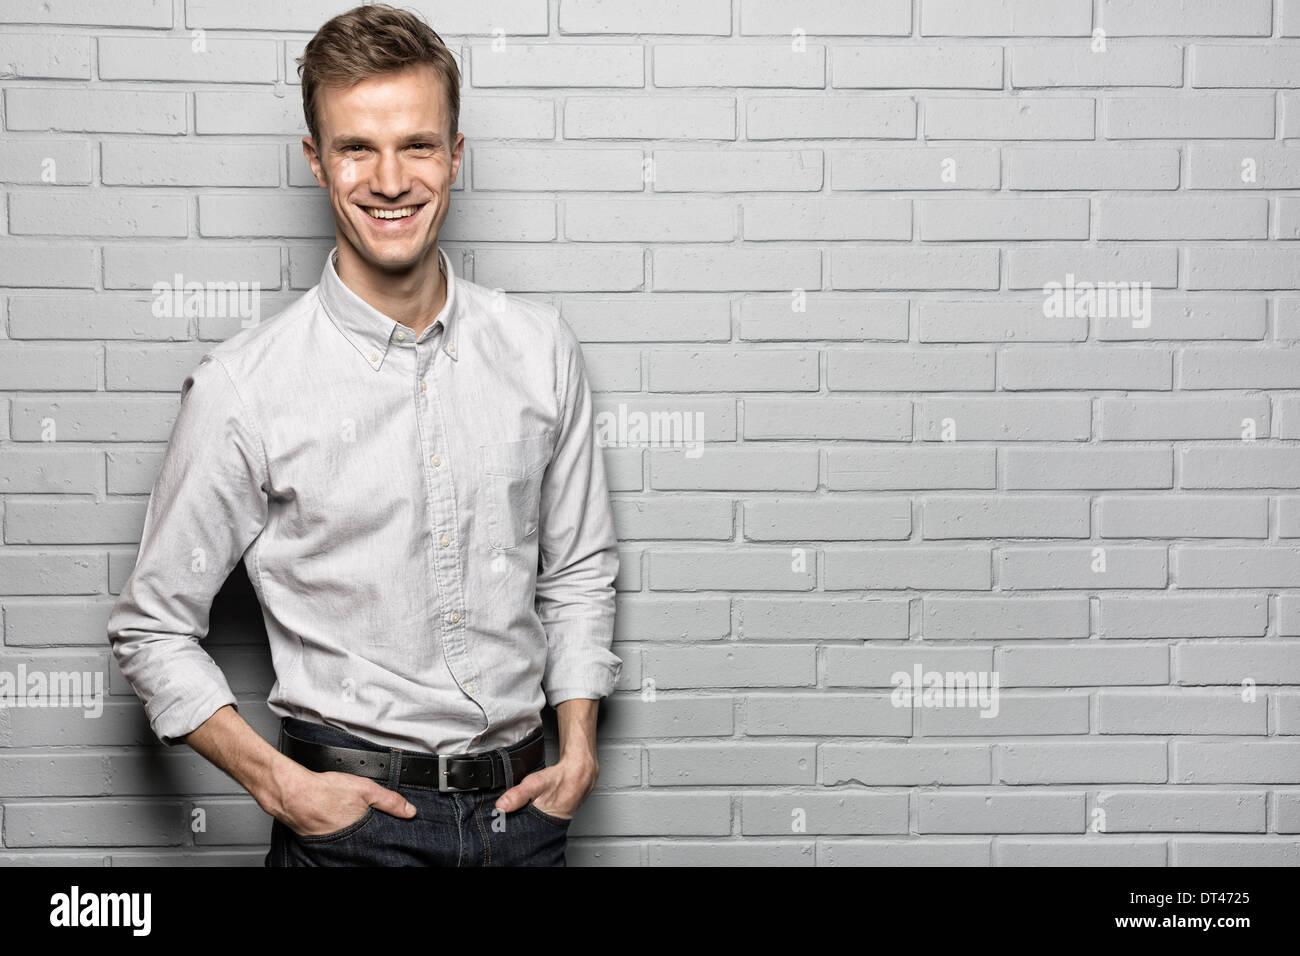 Male casual portrait smiling studio brick looking camera - Stock Image